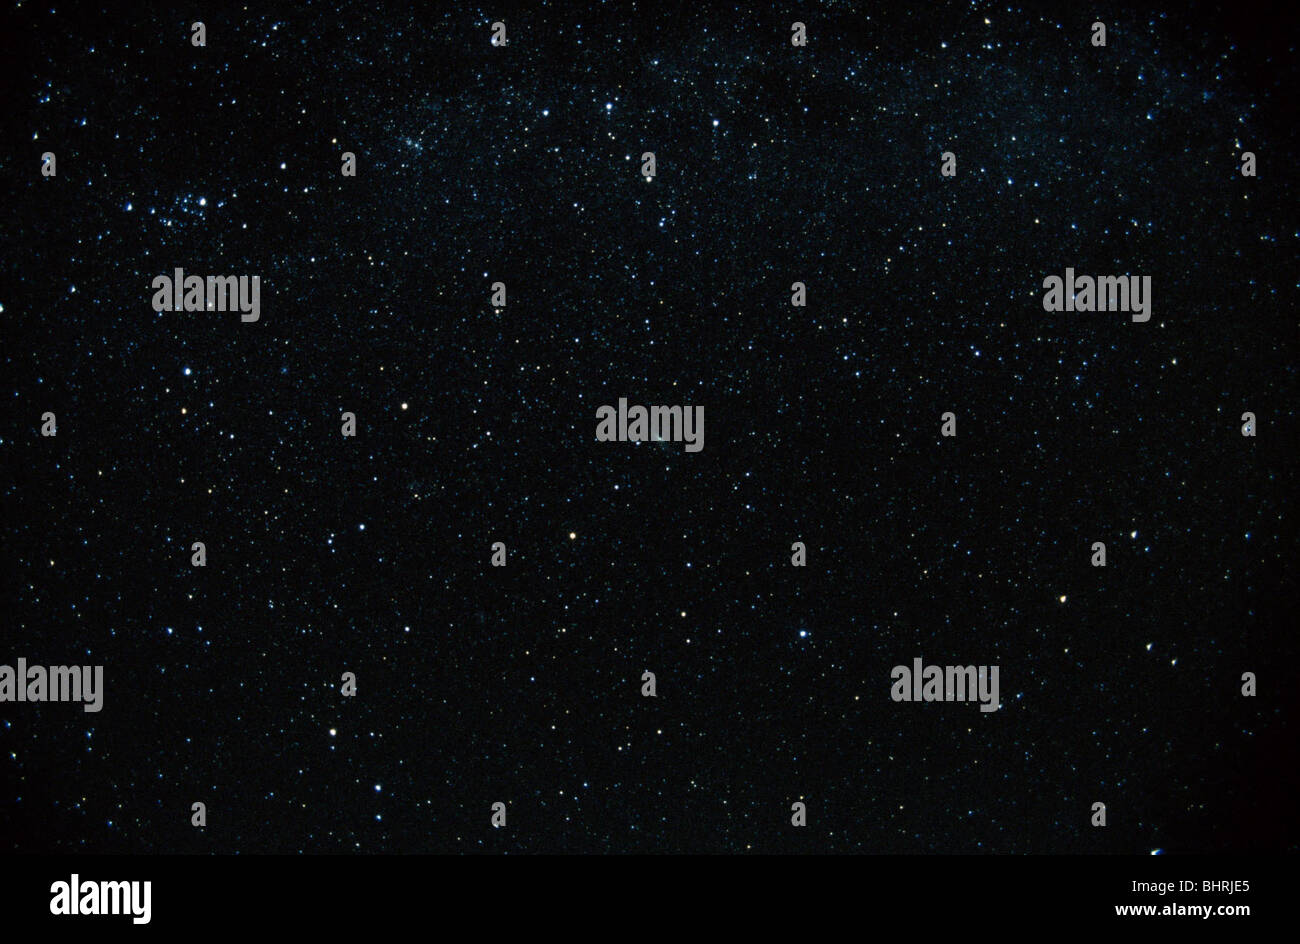 stelle nel cielo datazione Worcestershire siti di incontri ebraici gratuiti online